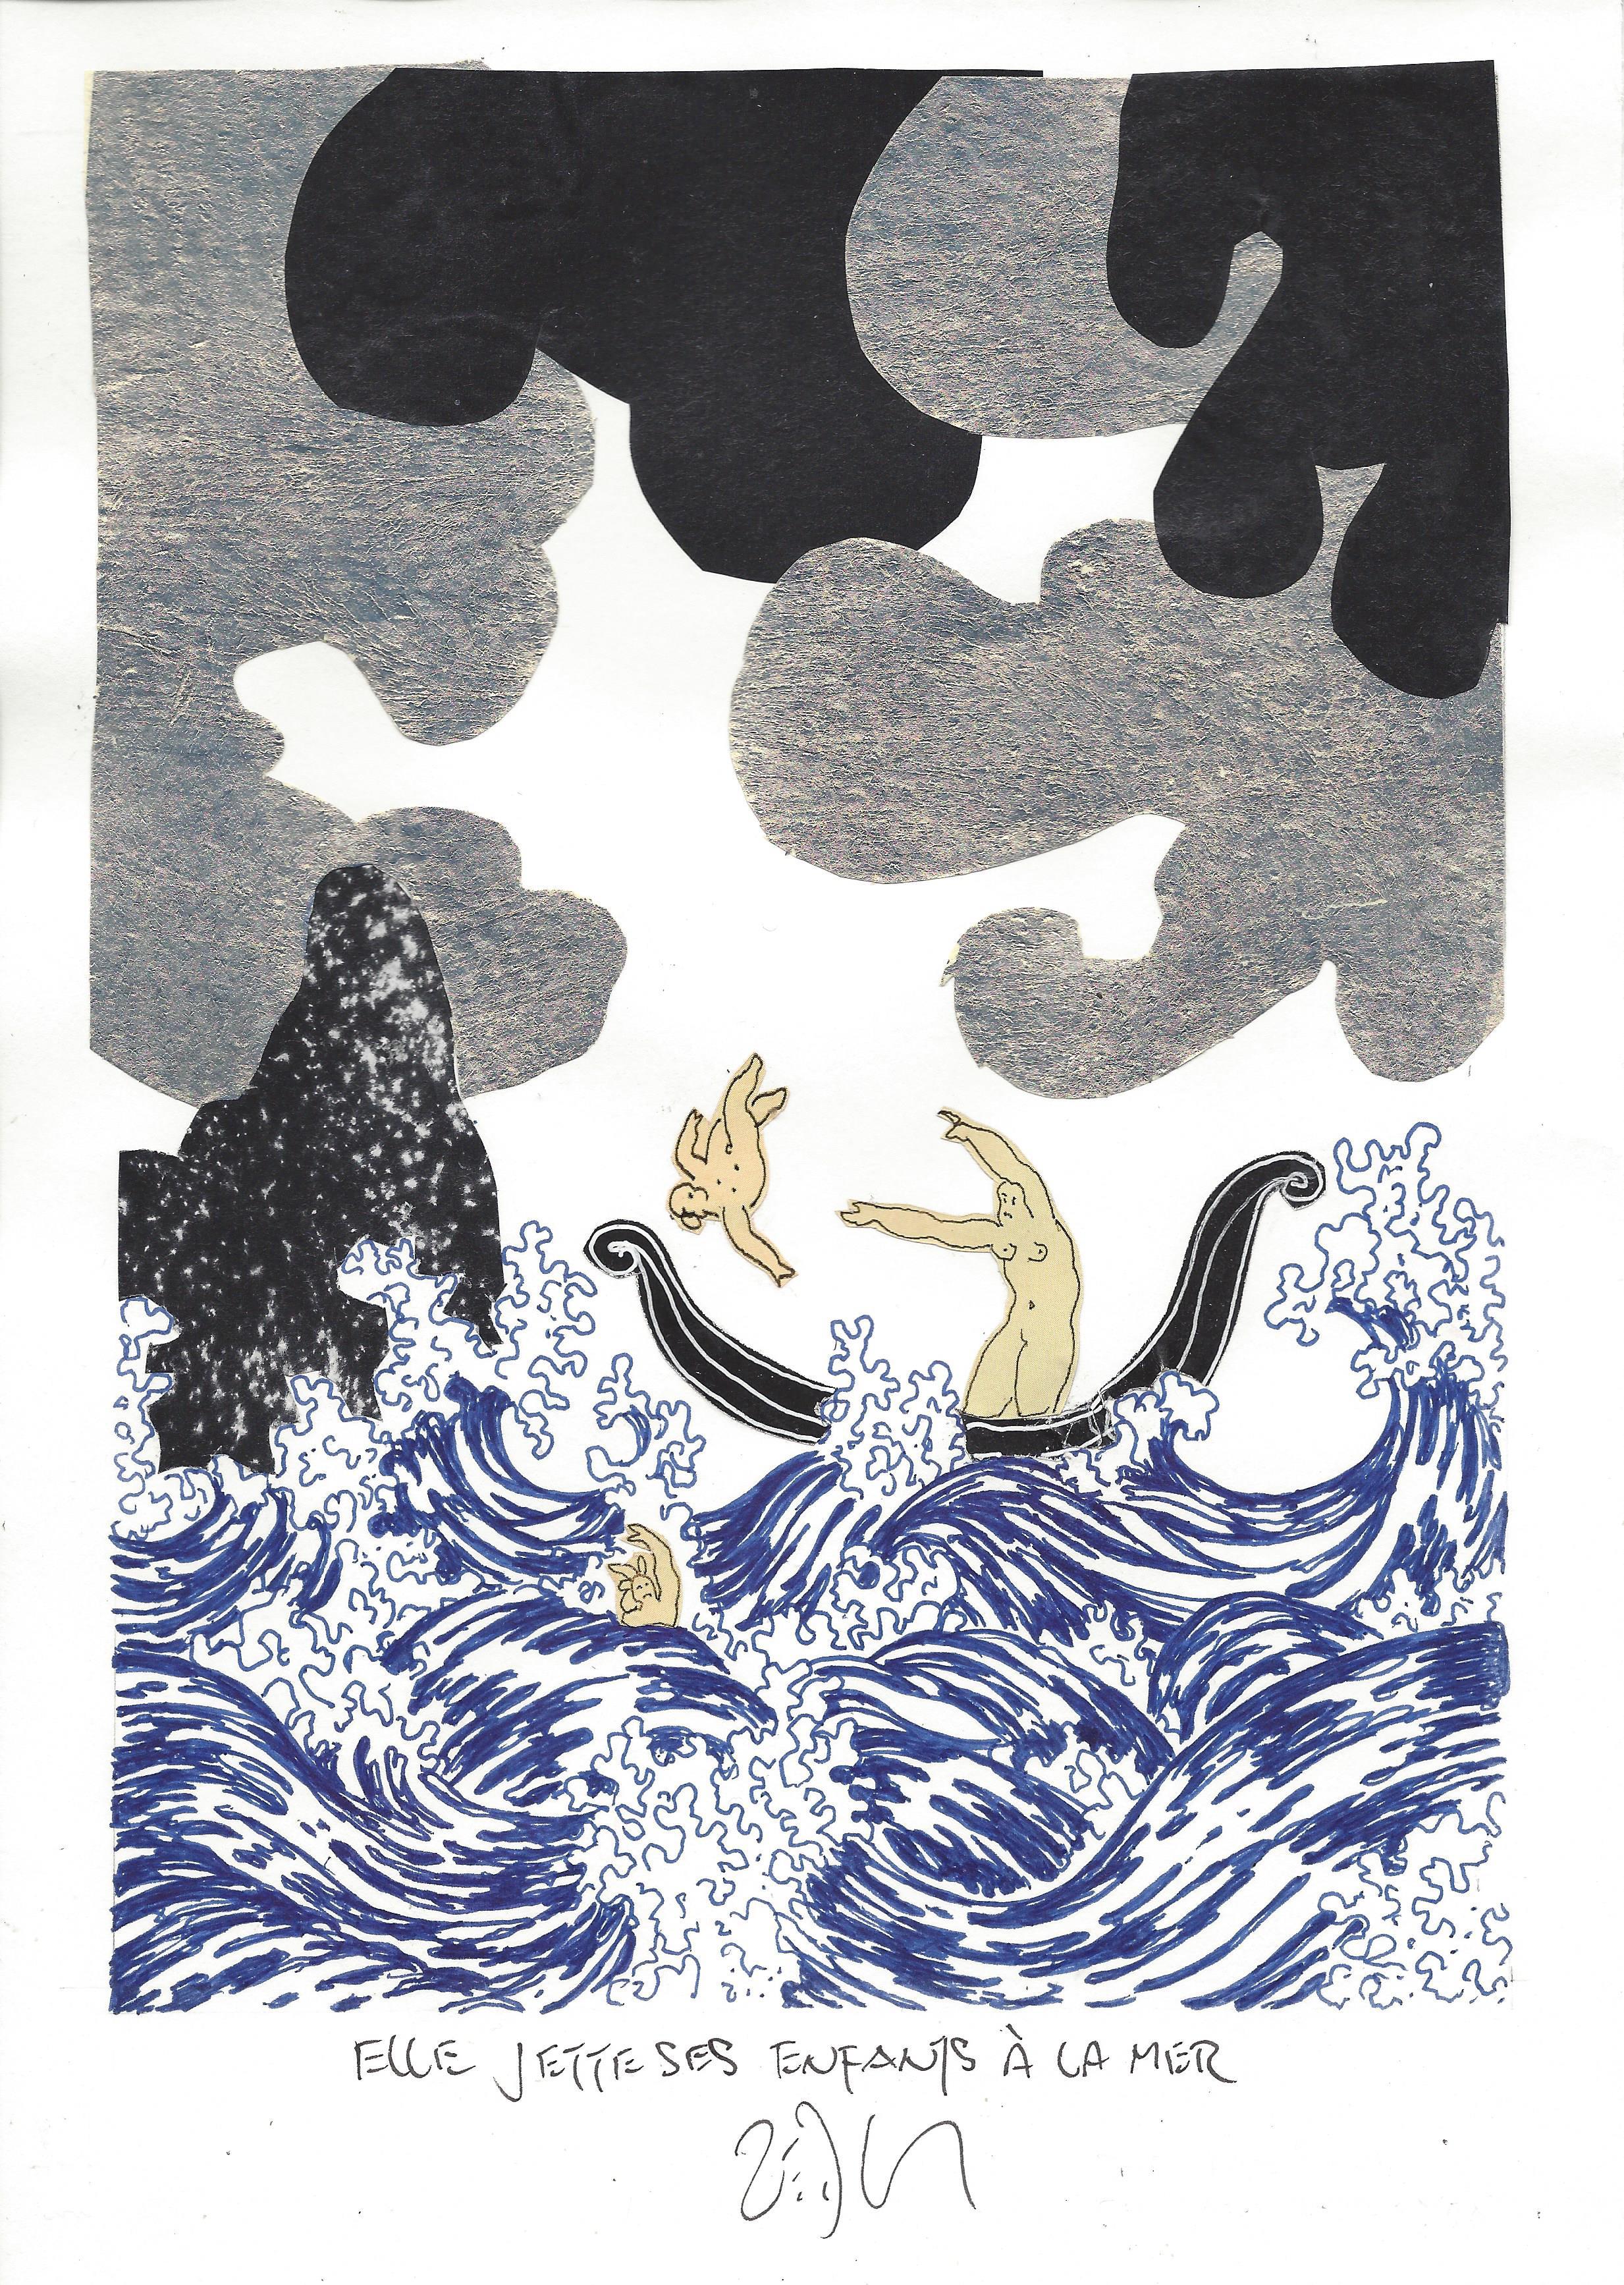 « She throws her children to the sea – Elle jette ses enfants à la mer »